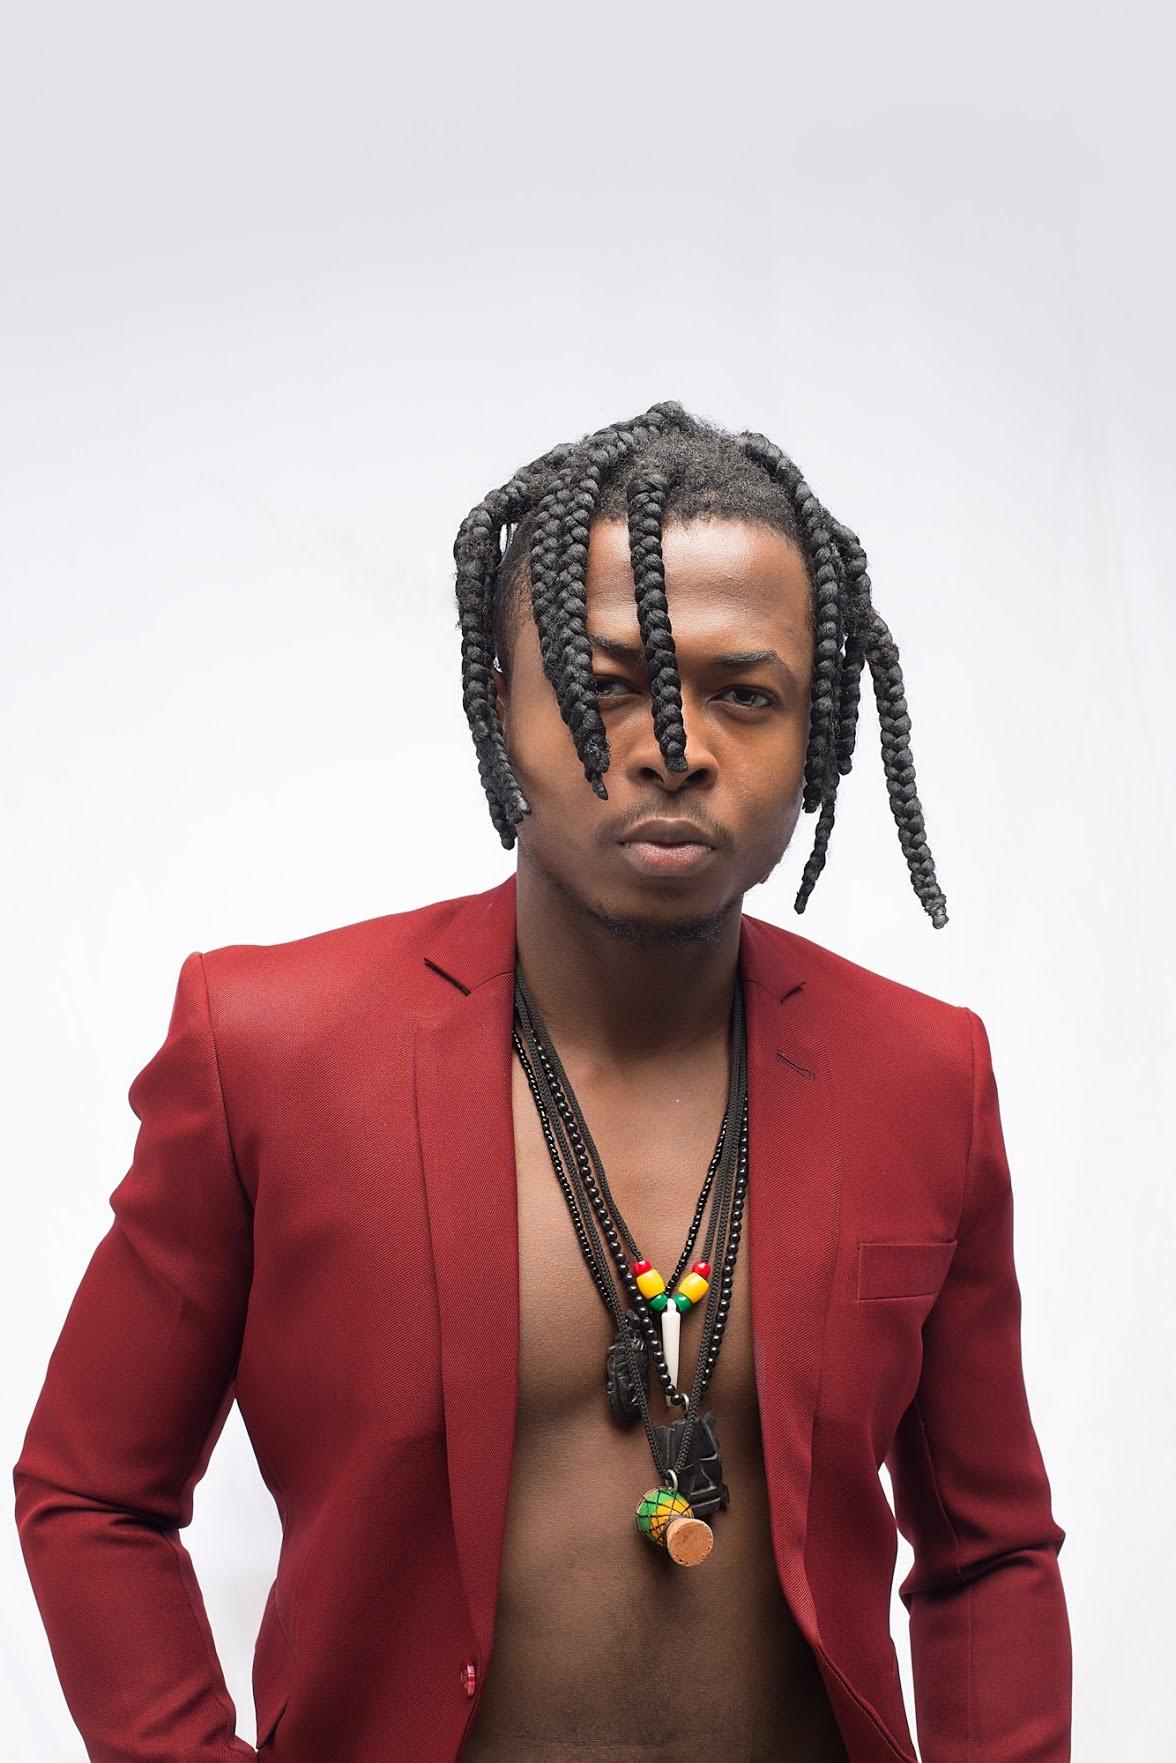 Bamz entertainment signs new act, Wilfresh